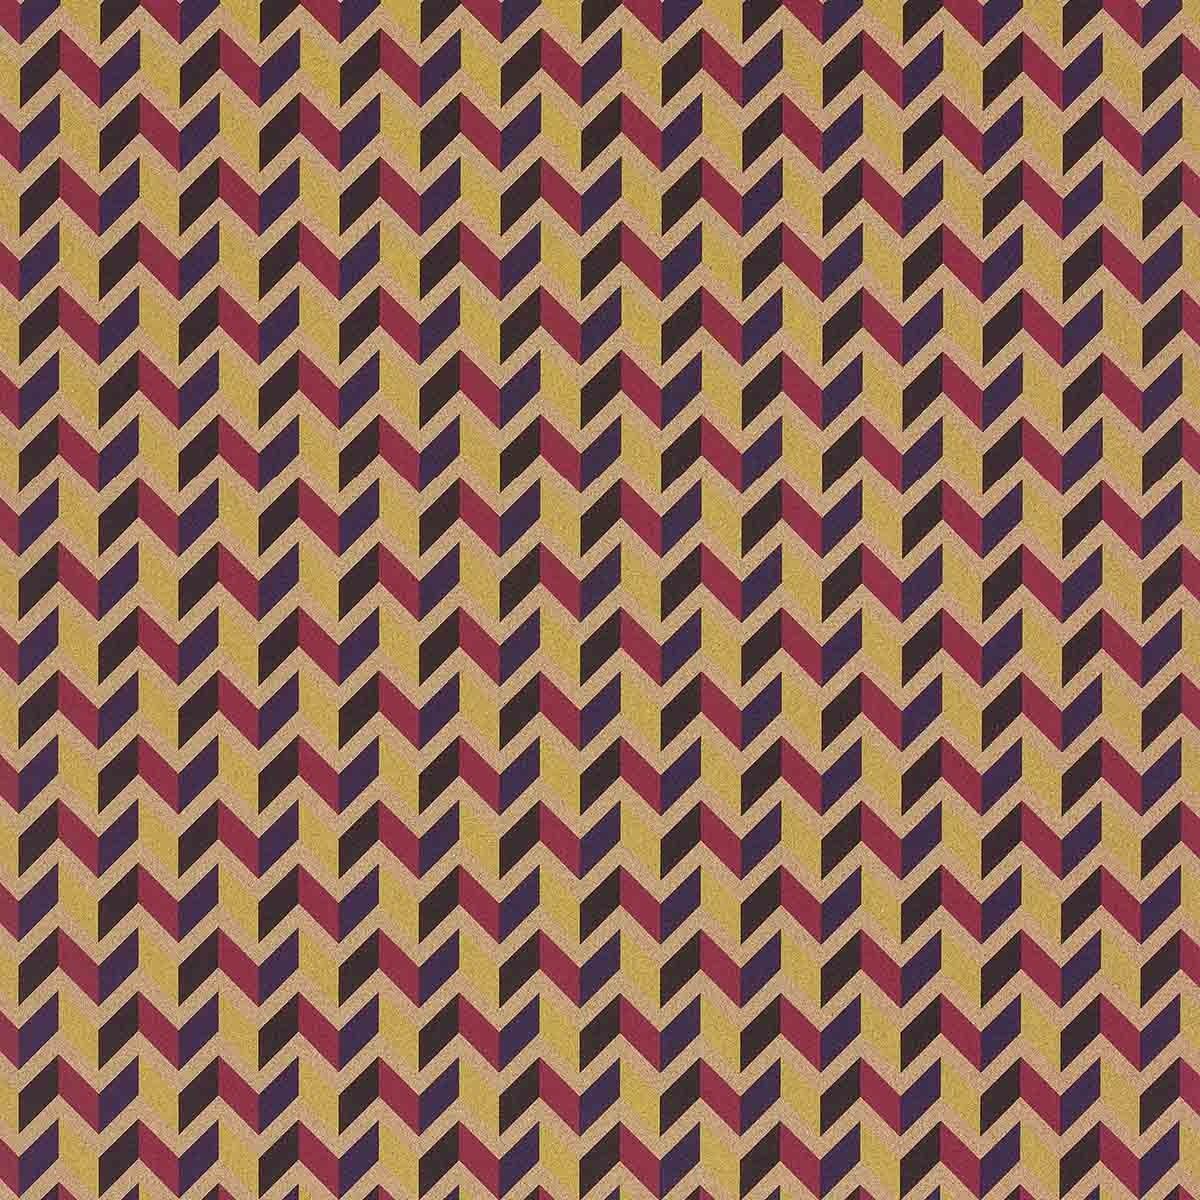 Decorative cork thin paper Iridescence 06.02